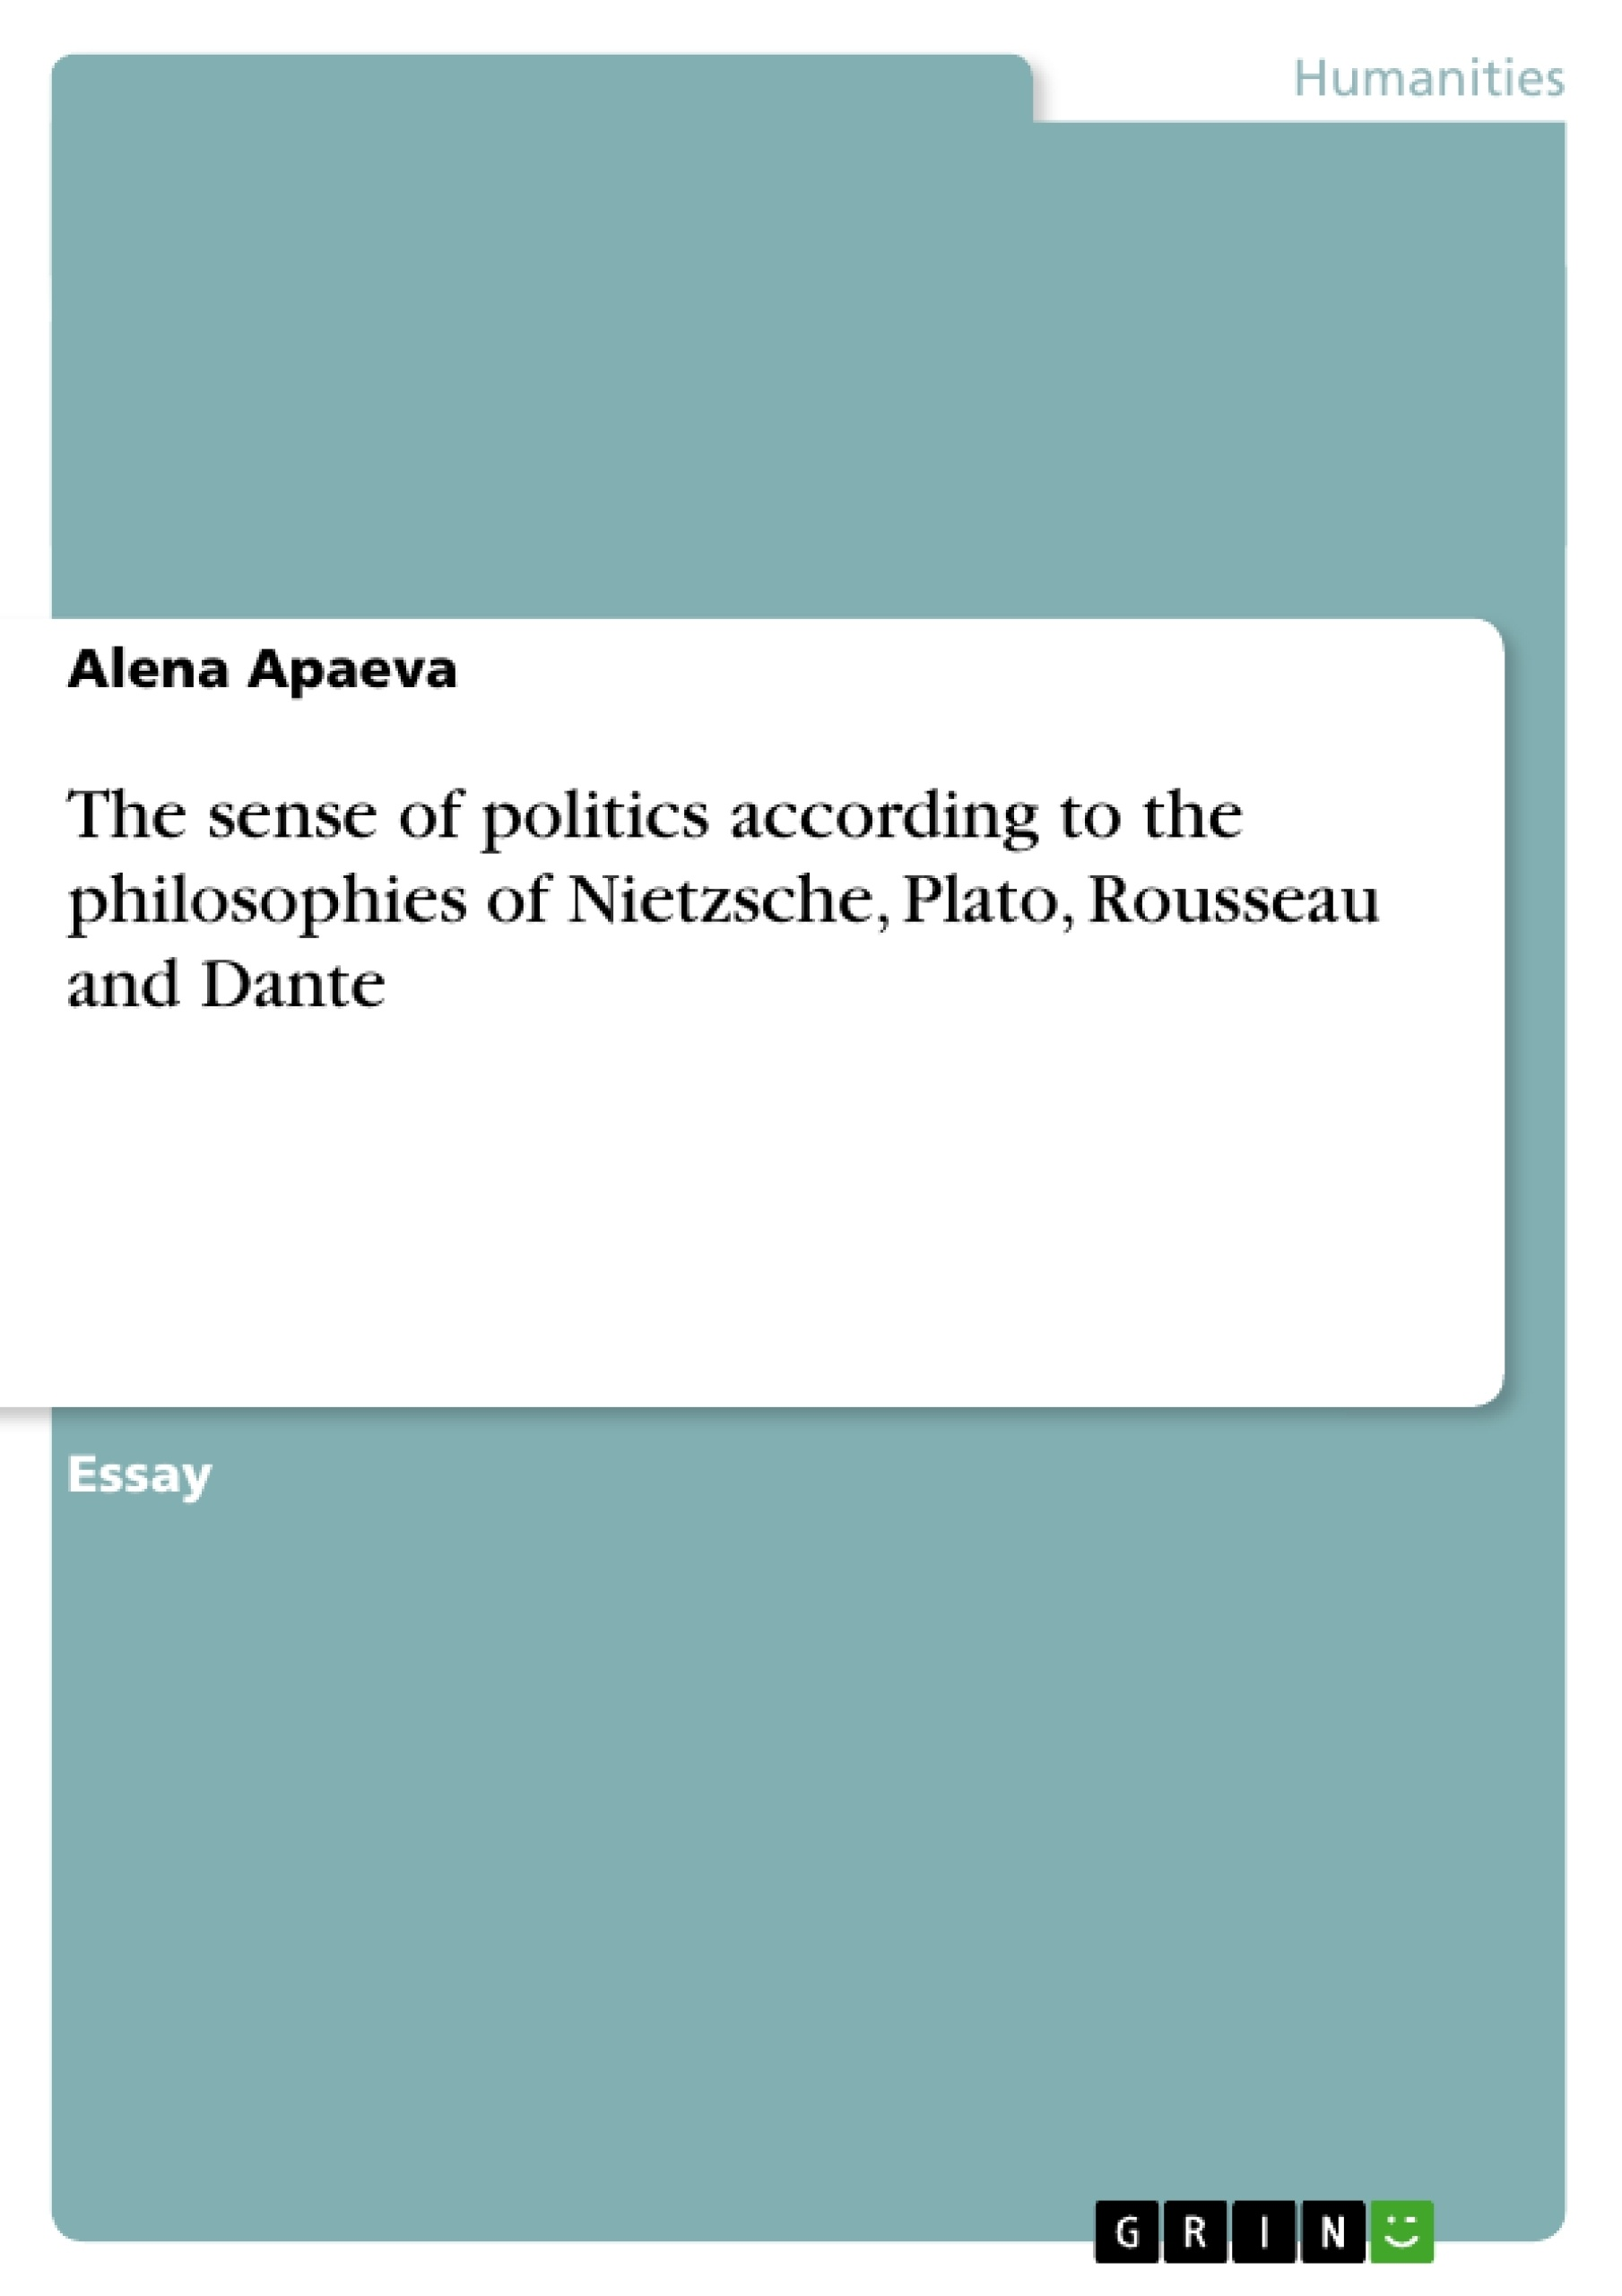 Title: The sense of politics according to the philosophies of Nietzsche, Plato, Rousseau and Dante